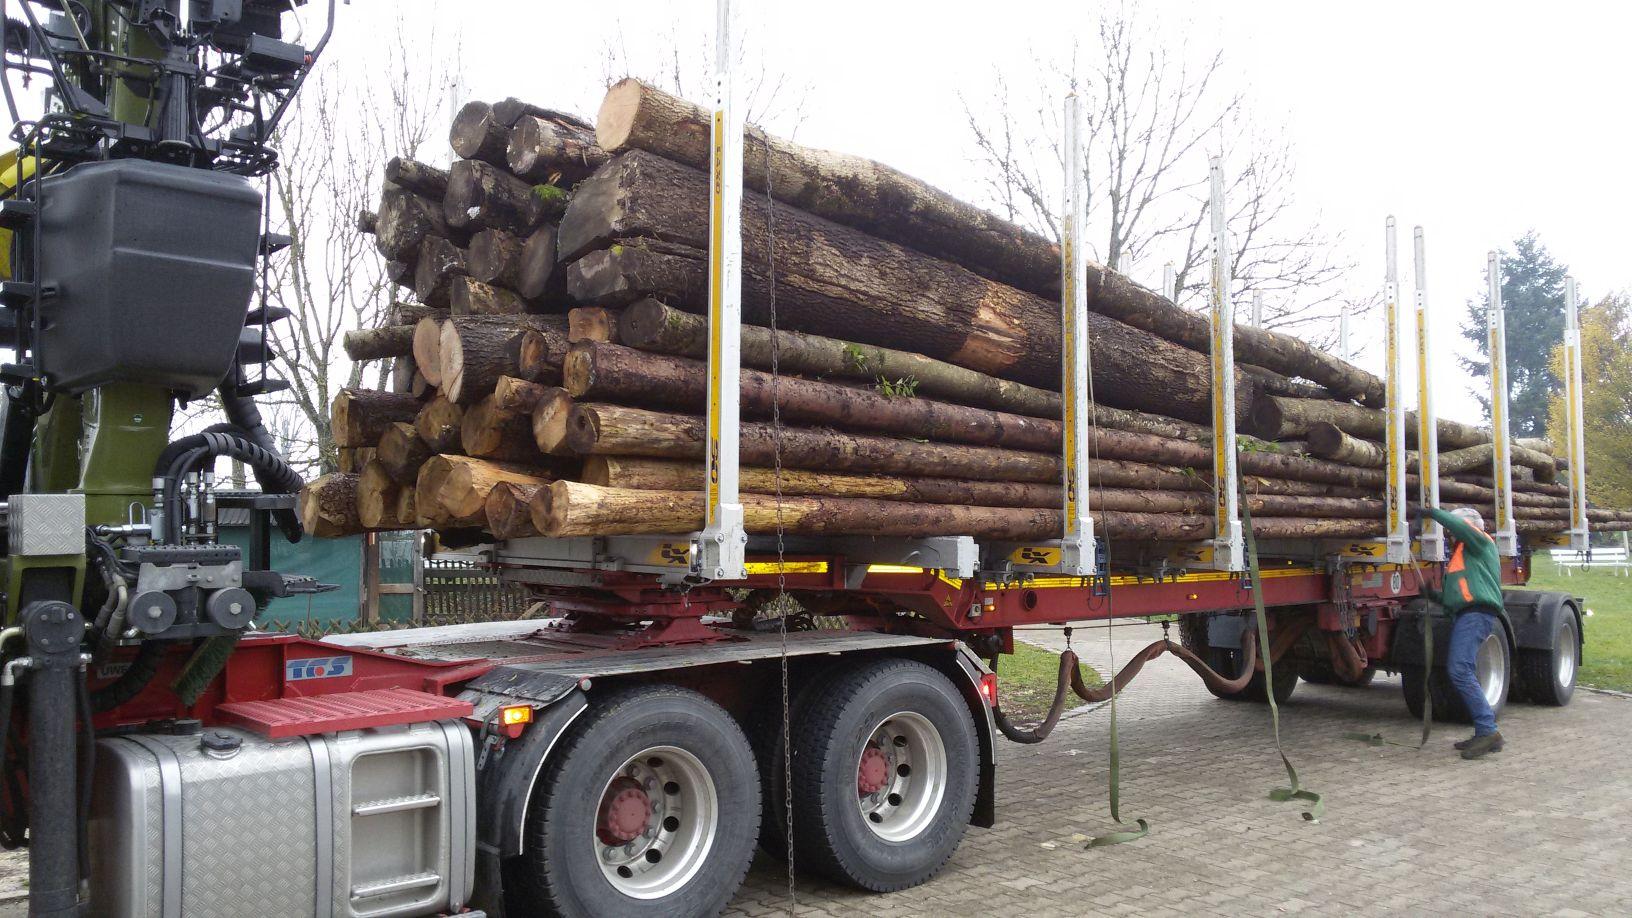 Holz- und Fahrspende